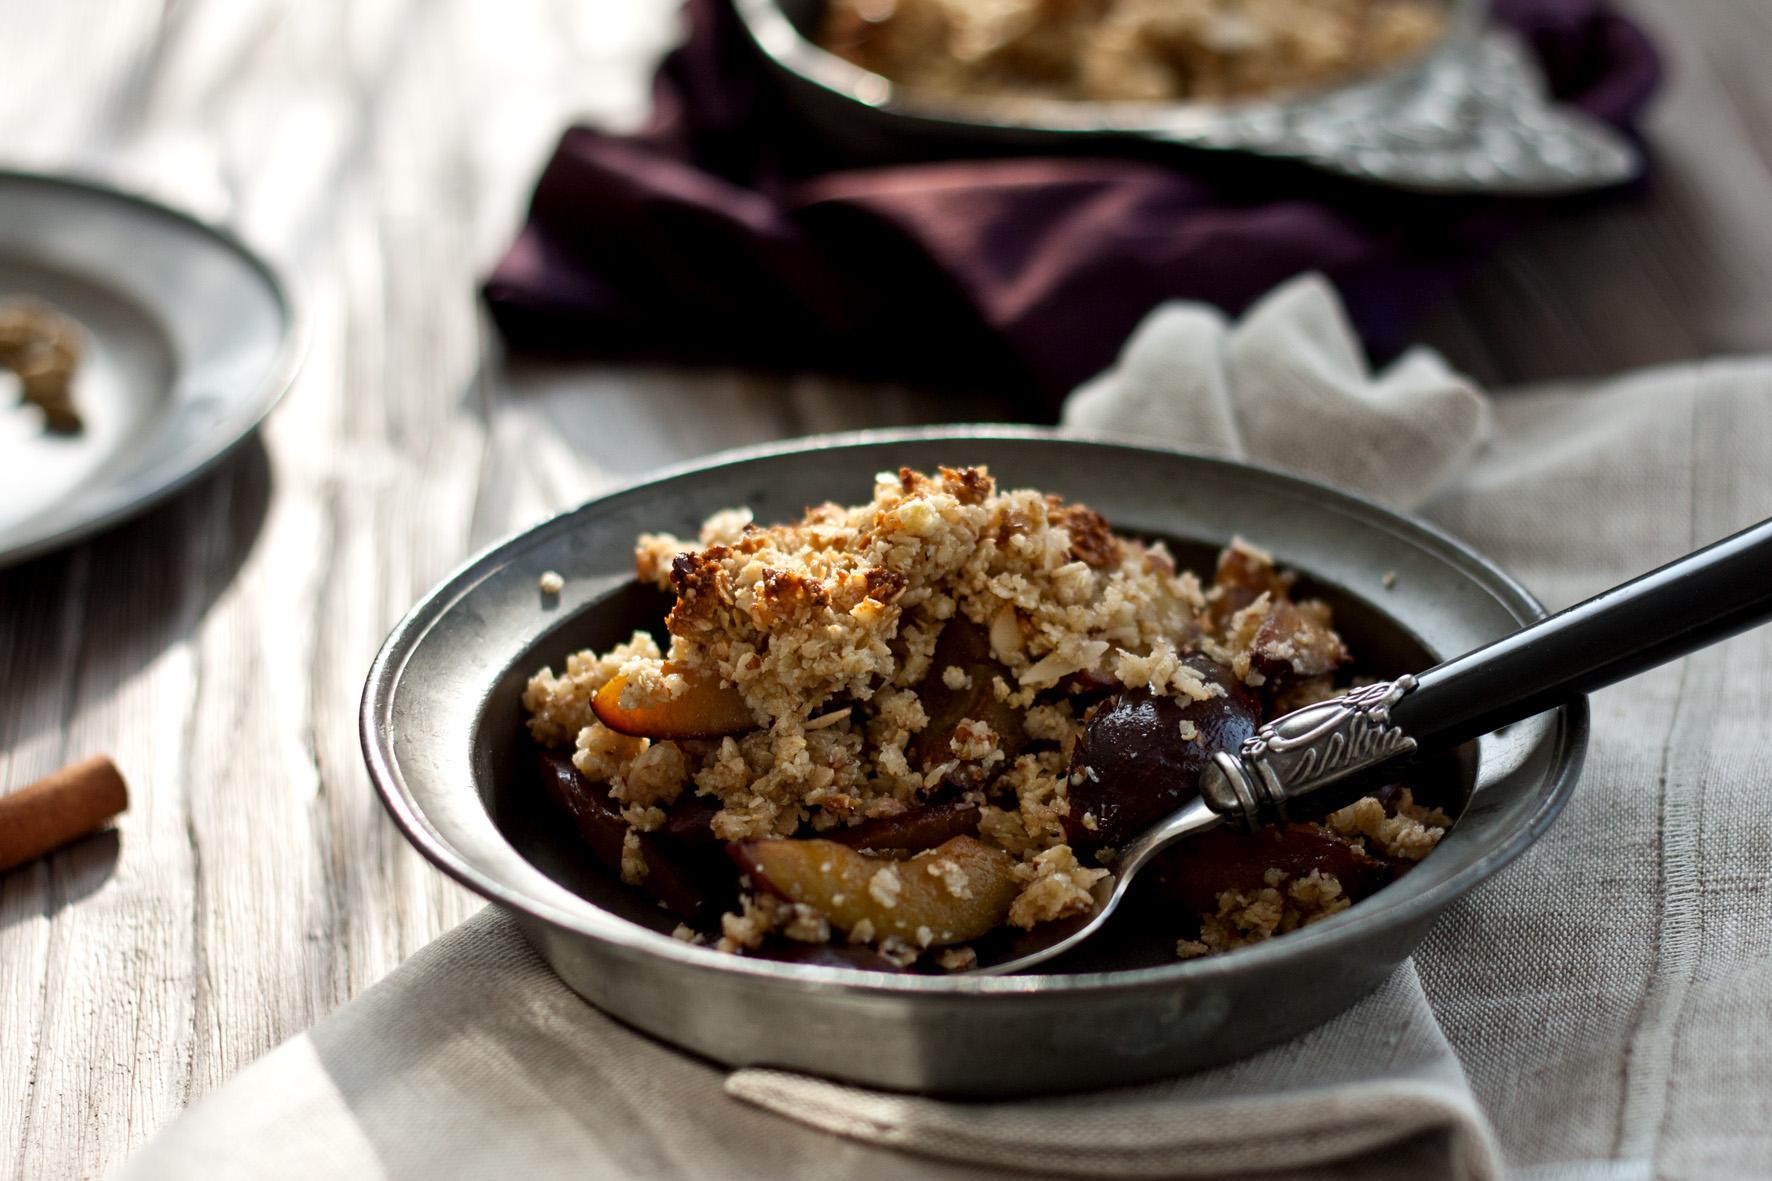 Pflaumen-Crumble-Quinoa-Buchweizen-6